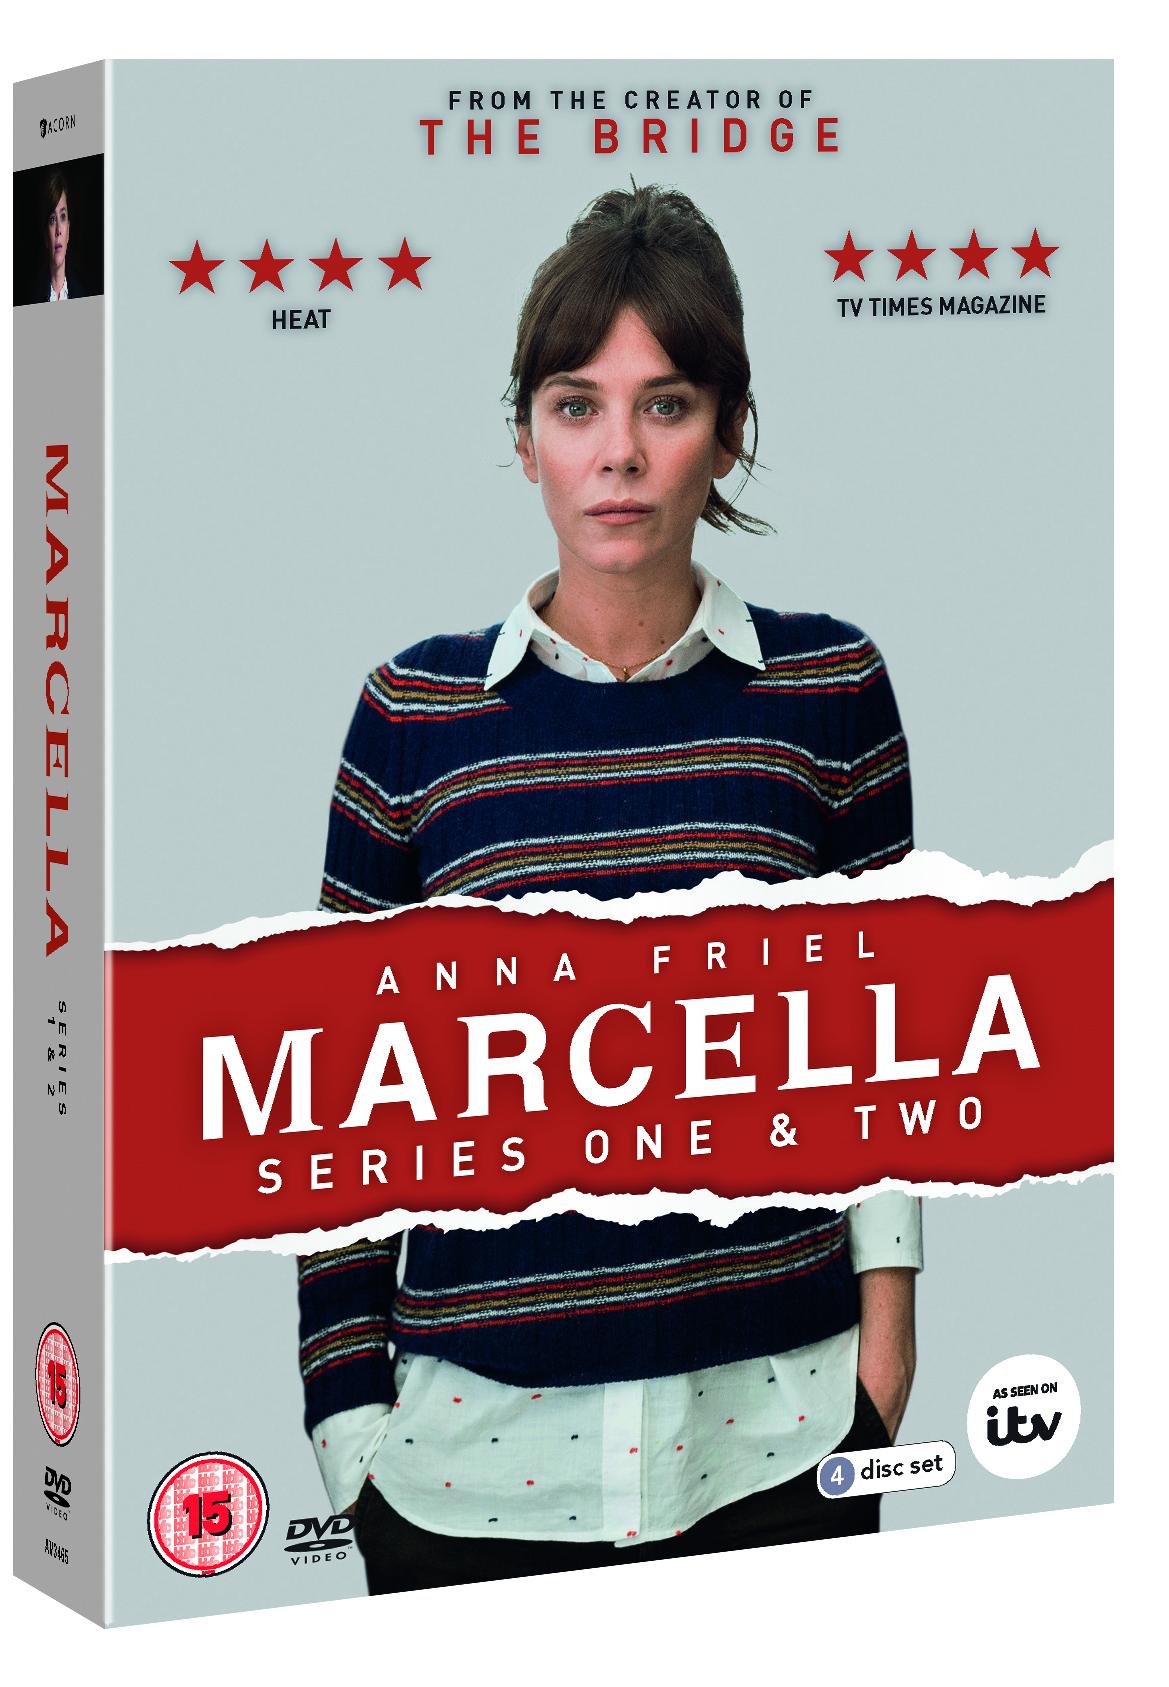 Marcella_Series1&2_DVD_3D.jpg